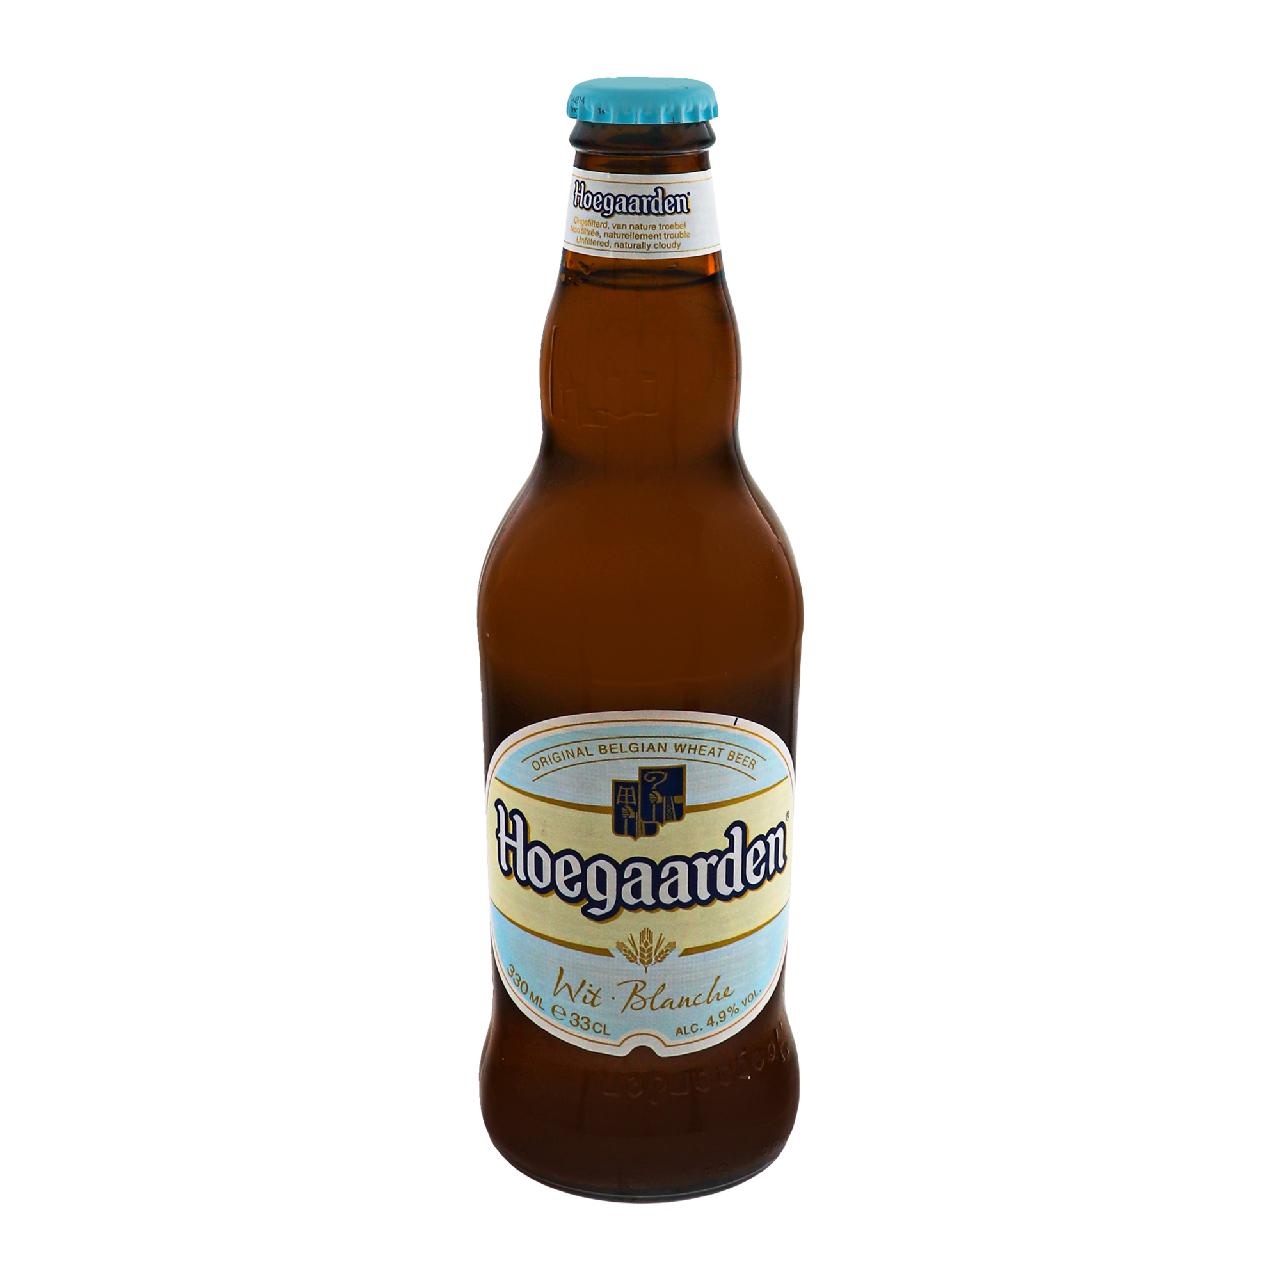 Пиво Hoegaarden Wit Blanche світле нефільтроване 4.9% 0.33л